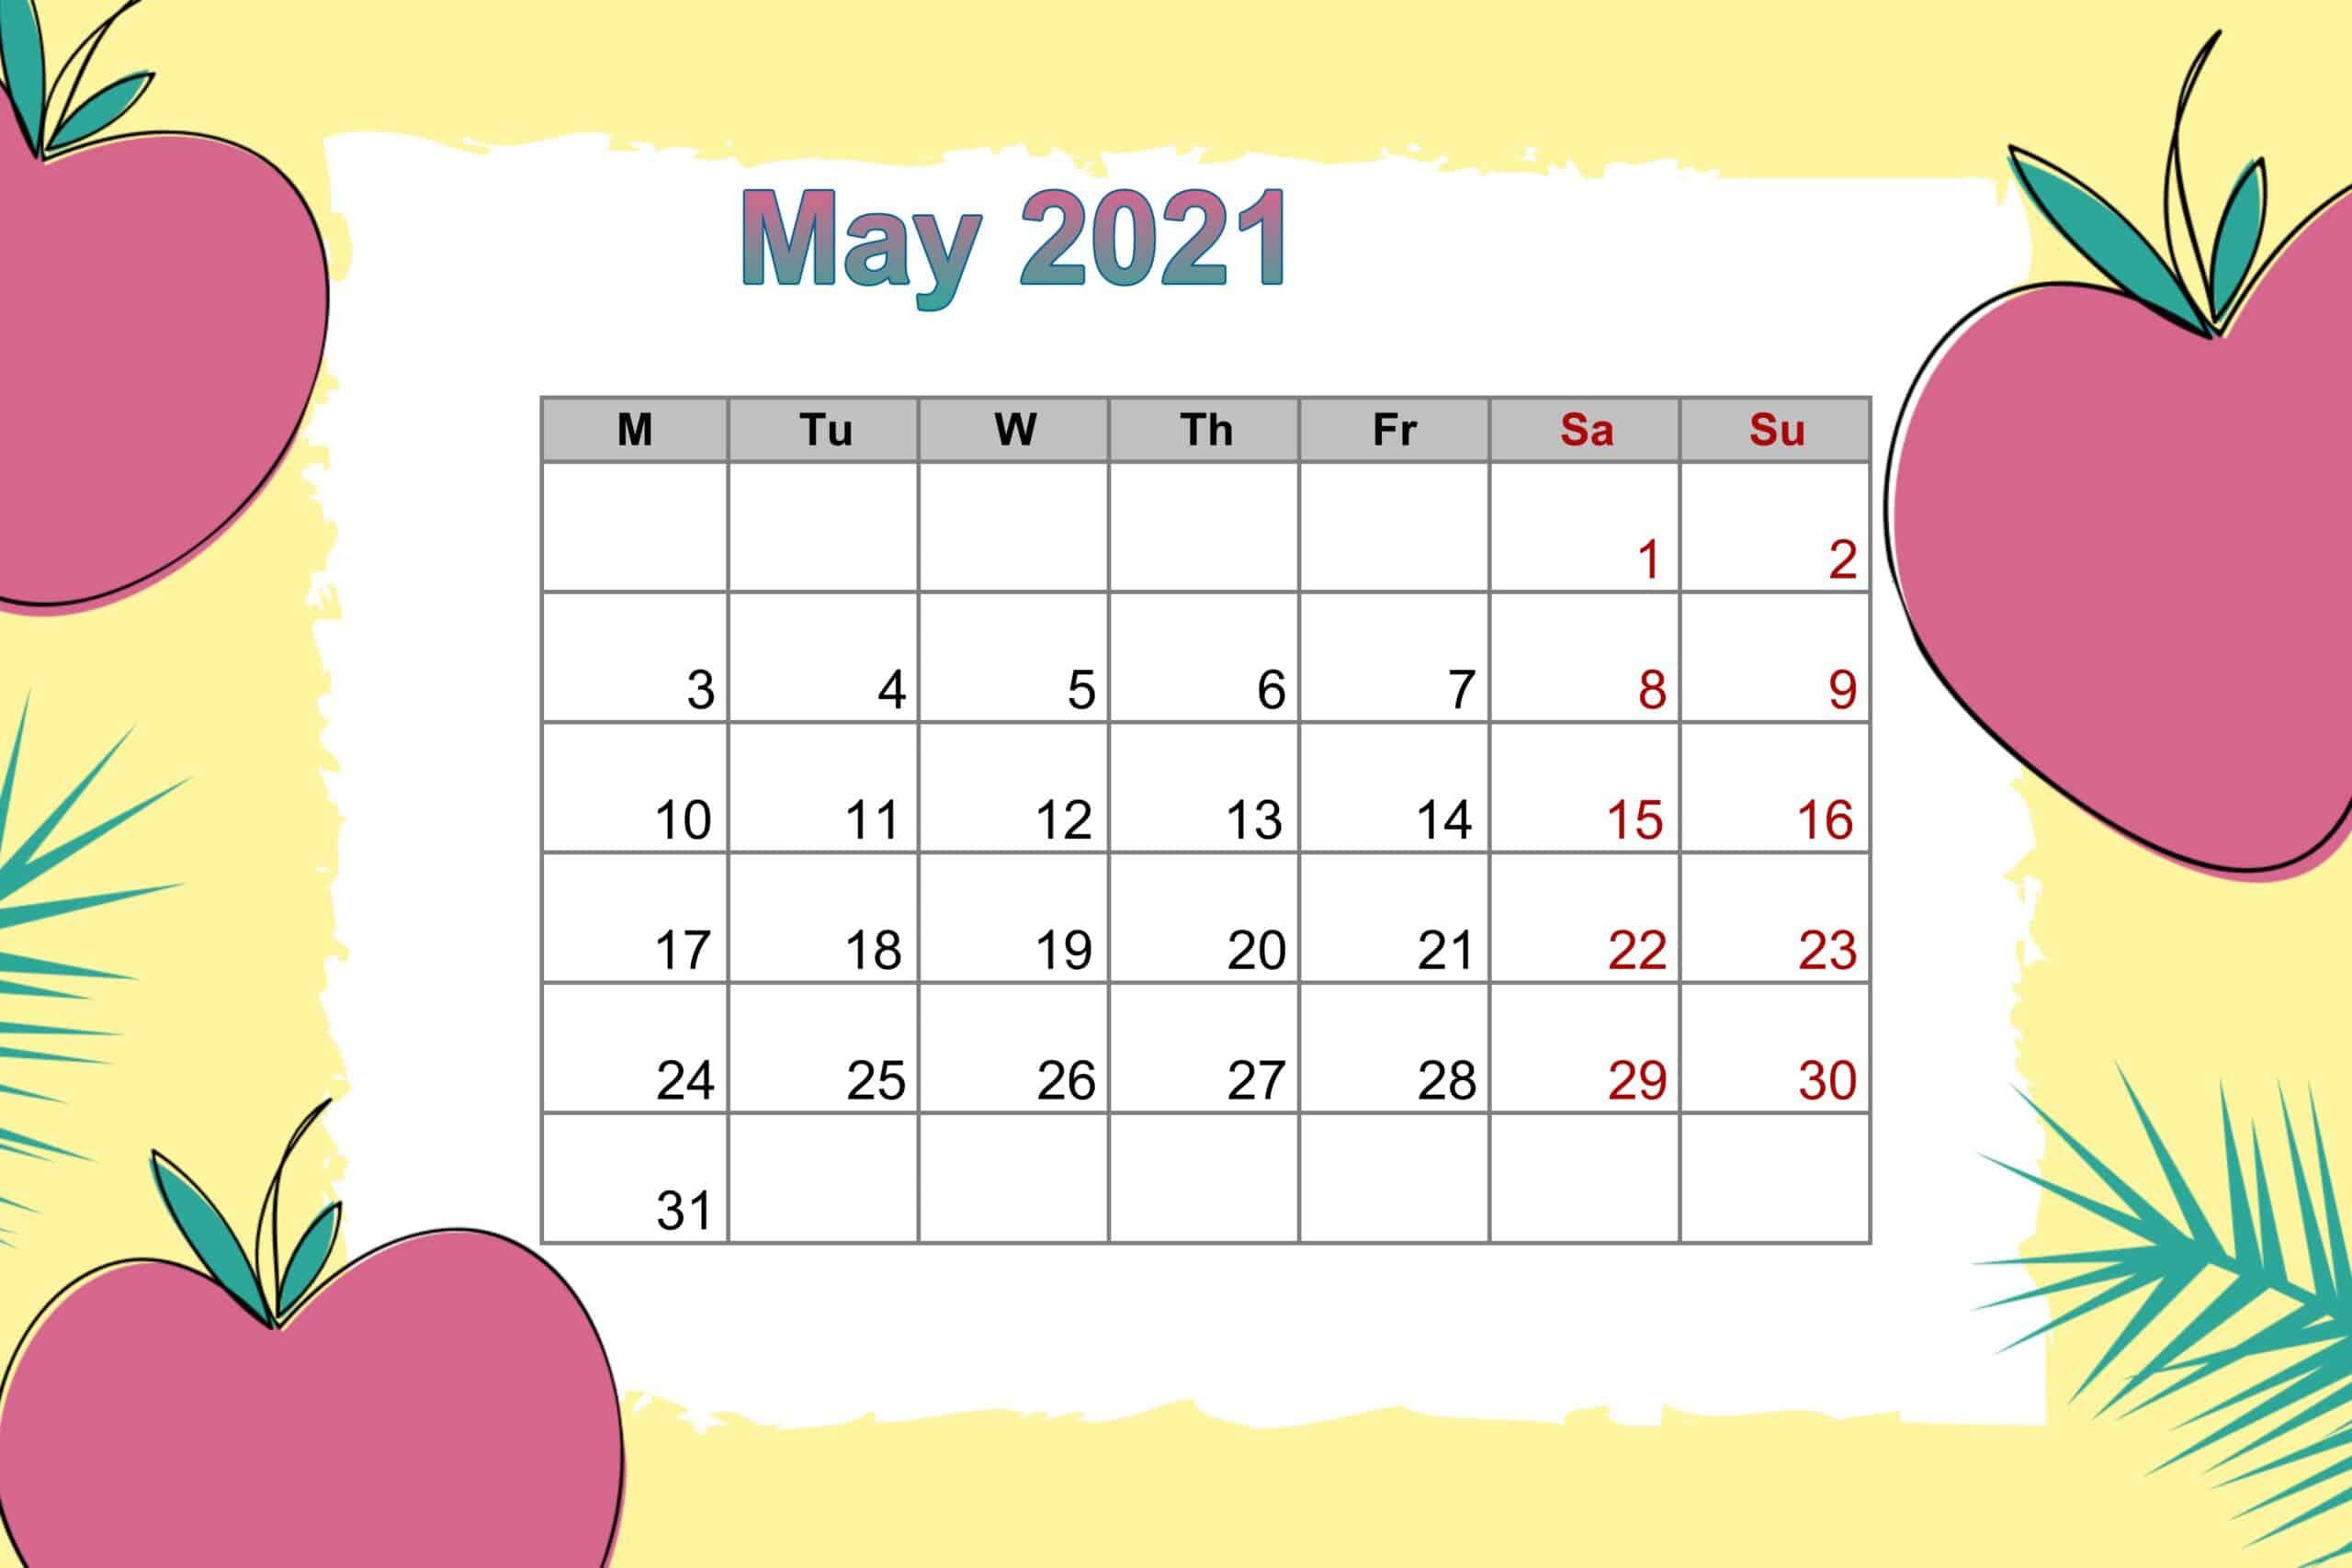 May 2021 Floral Calendar